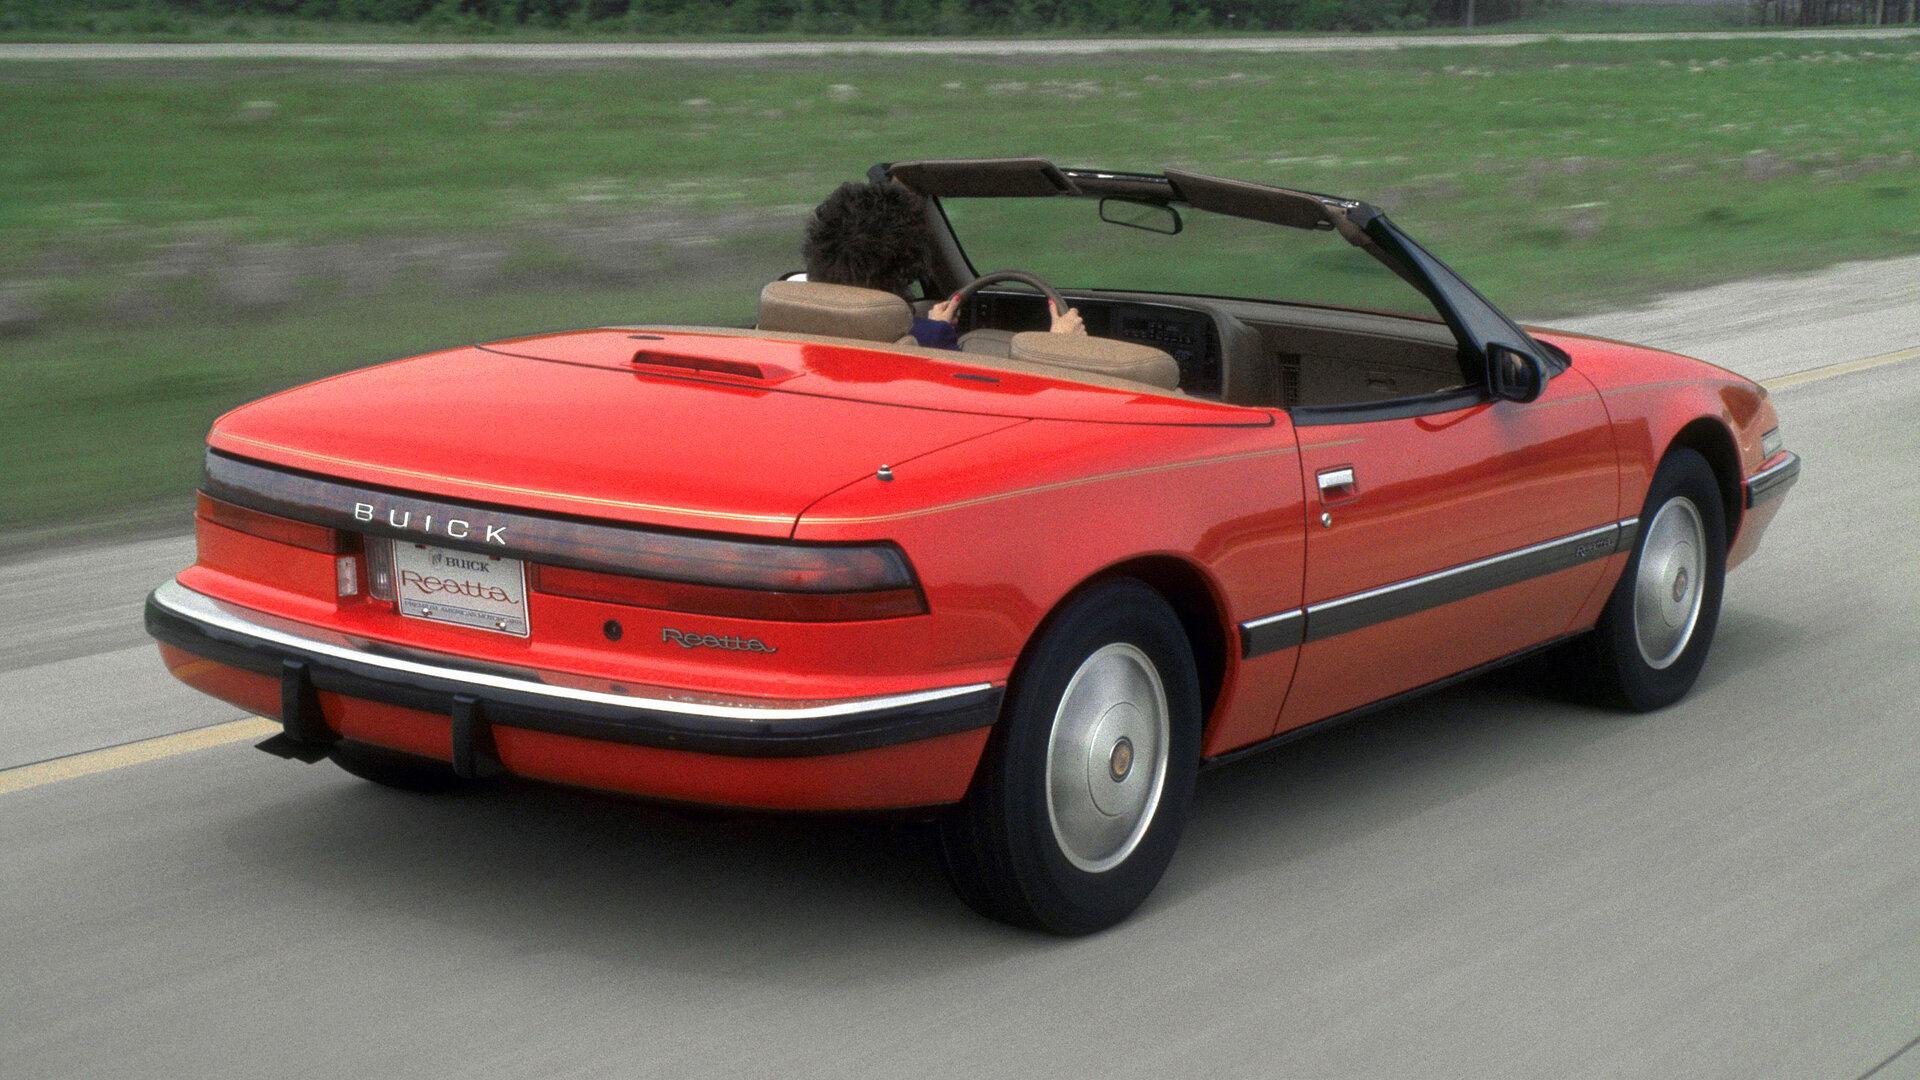 1990 Buick Reatta Convertible 1